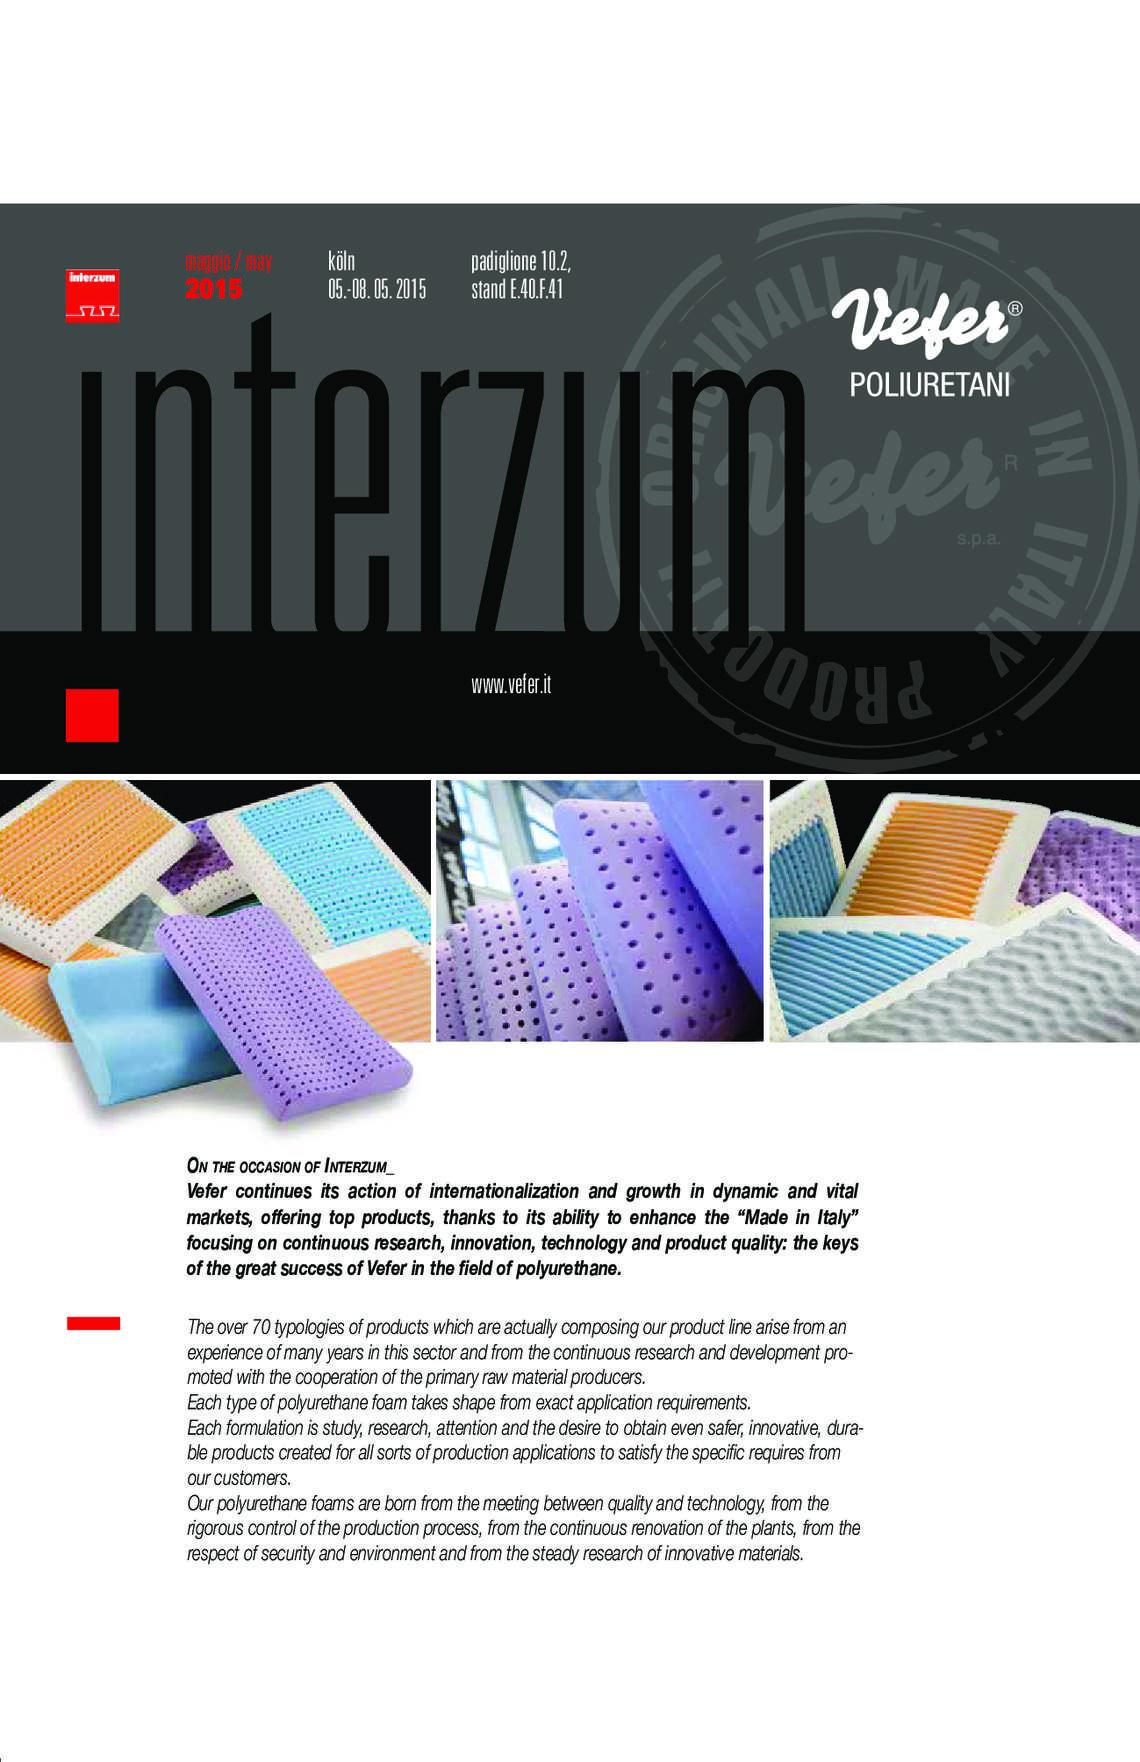 interzum-2015_journal_0_039.jpg